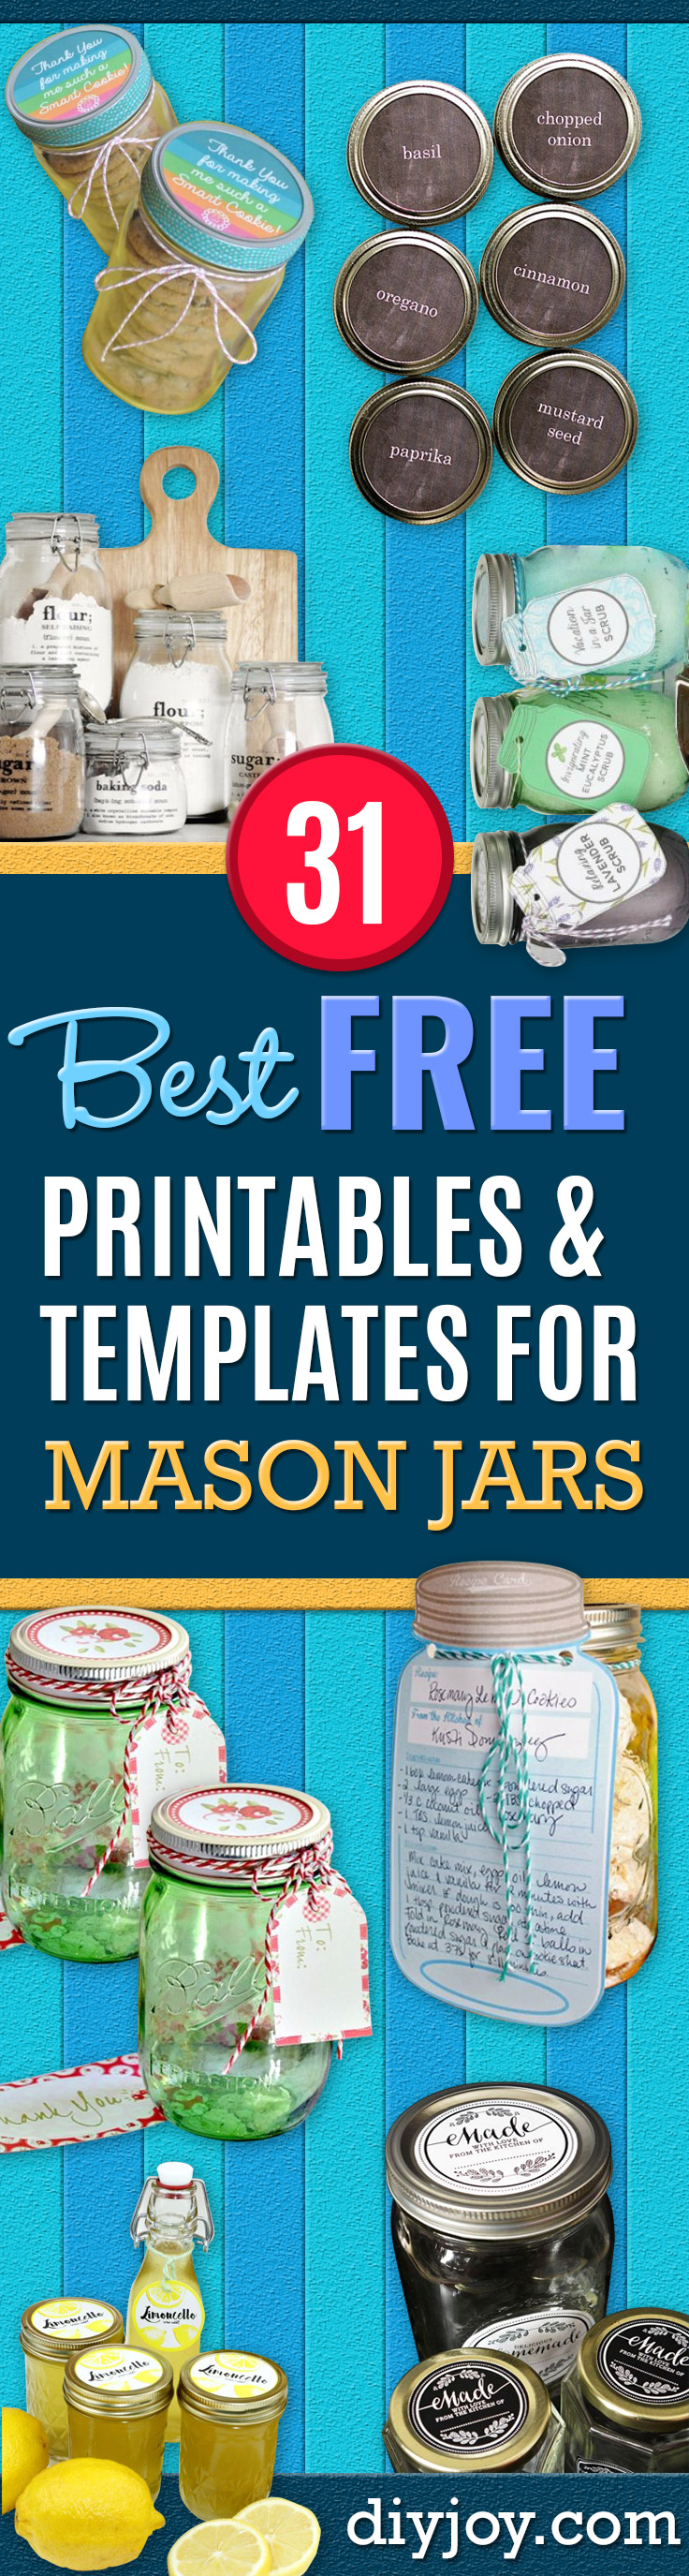 free printables for jars - mason jar printables free- printable tags and Printable Clip Art for Fun Mason Jar Gifts and Organization - Sugar scrub, Teacher Gifts, Valentines, Cookie Mixes, Party Favors